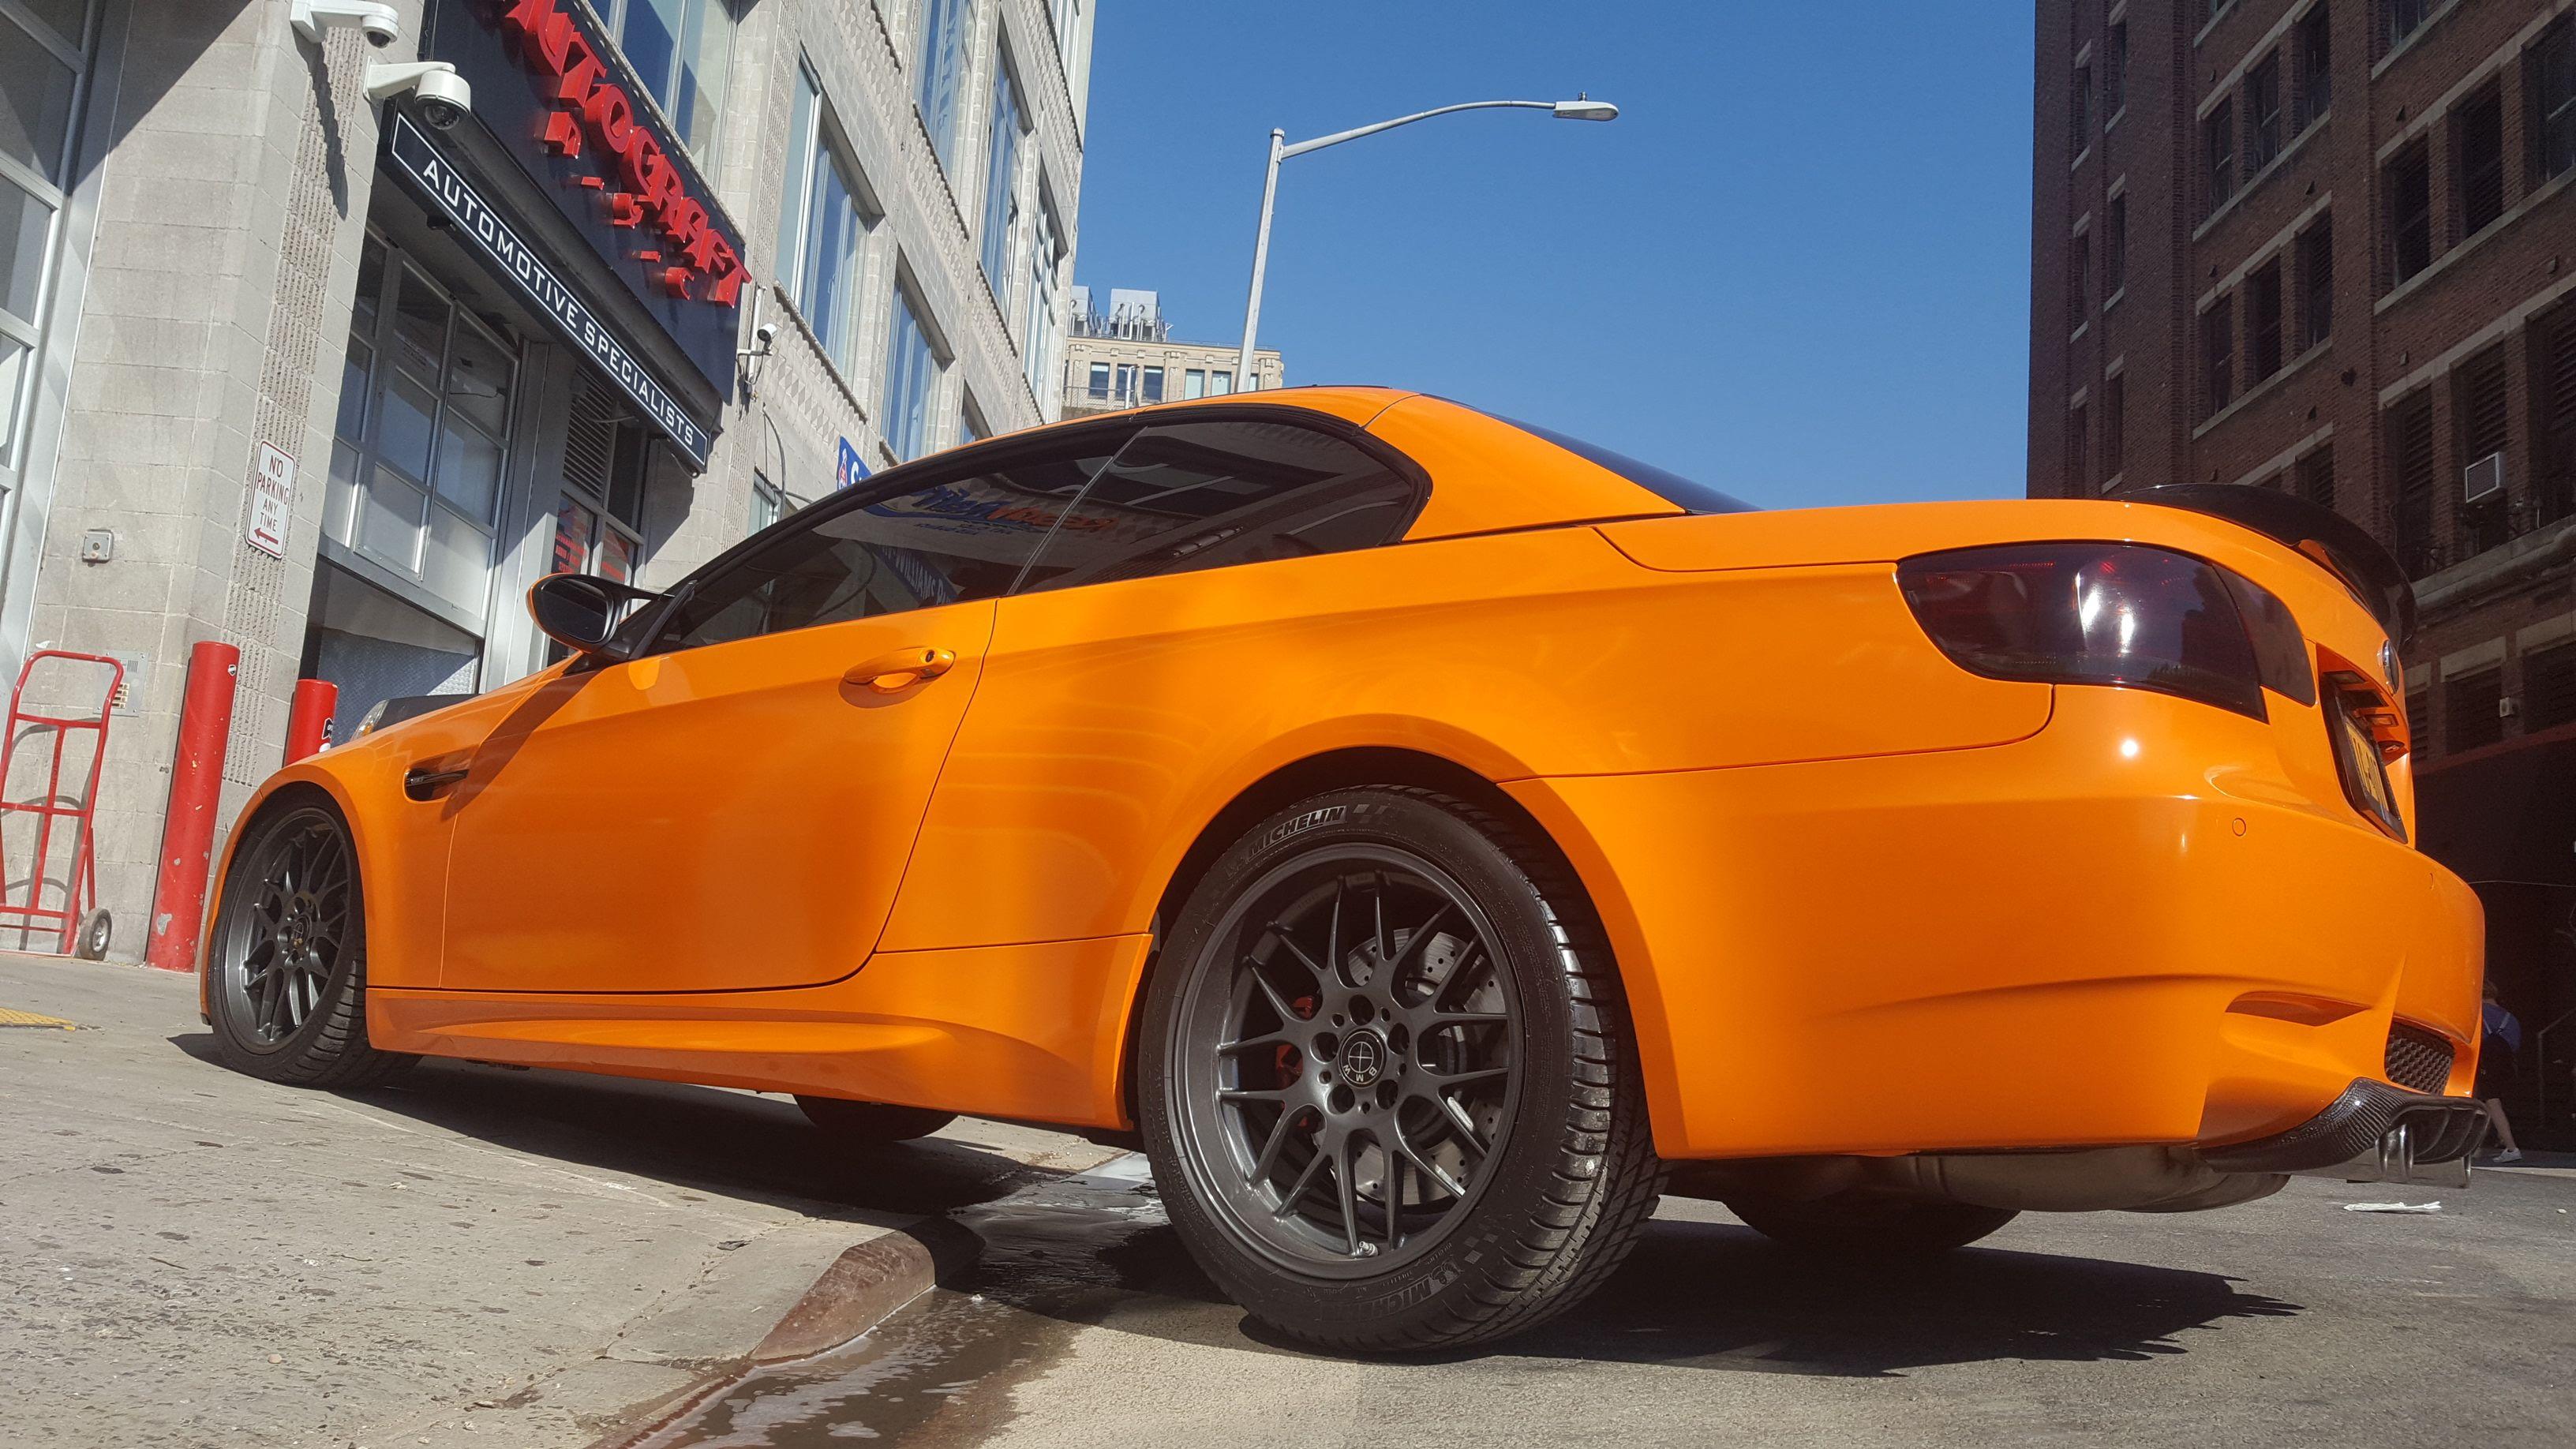 Full Orange Wrap Custom Wraps Custom Cars Entertainment System